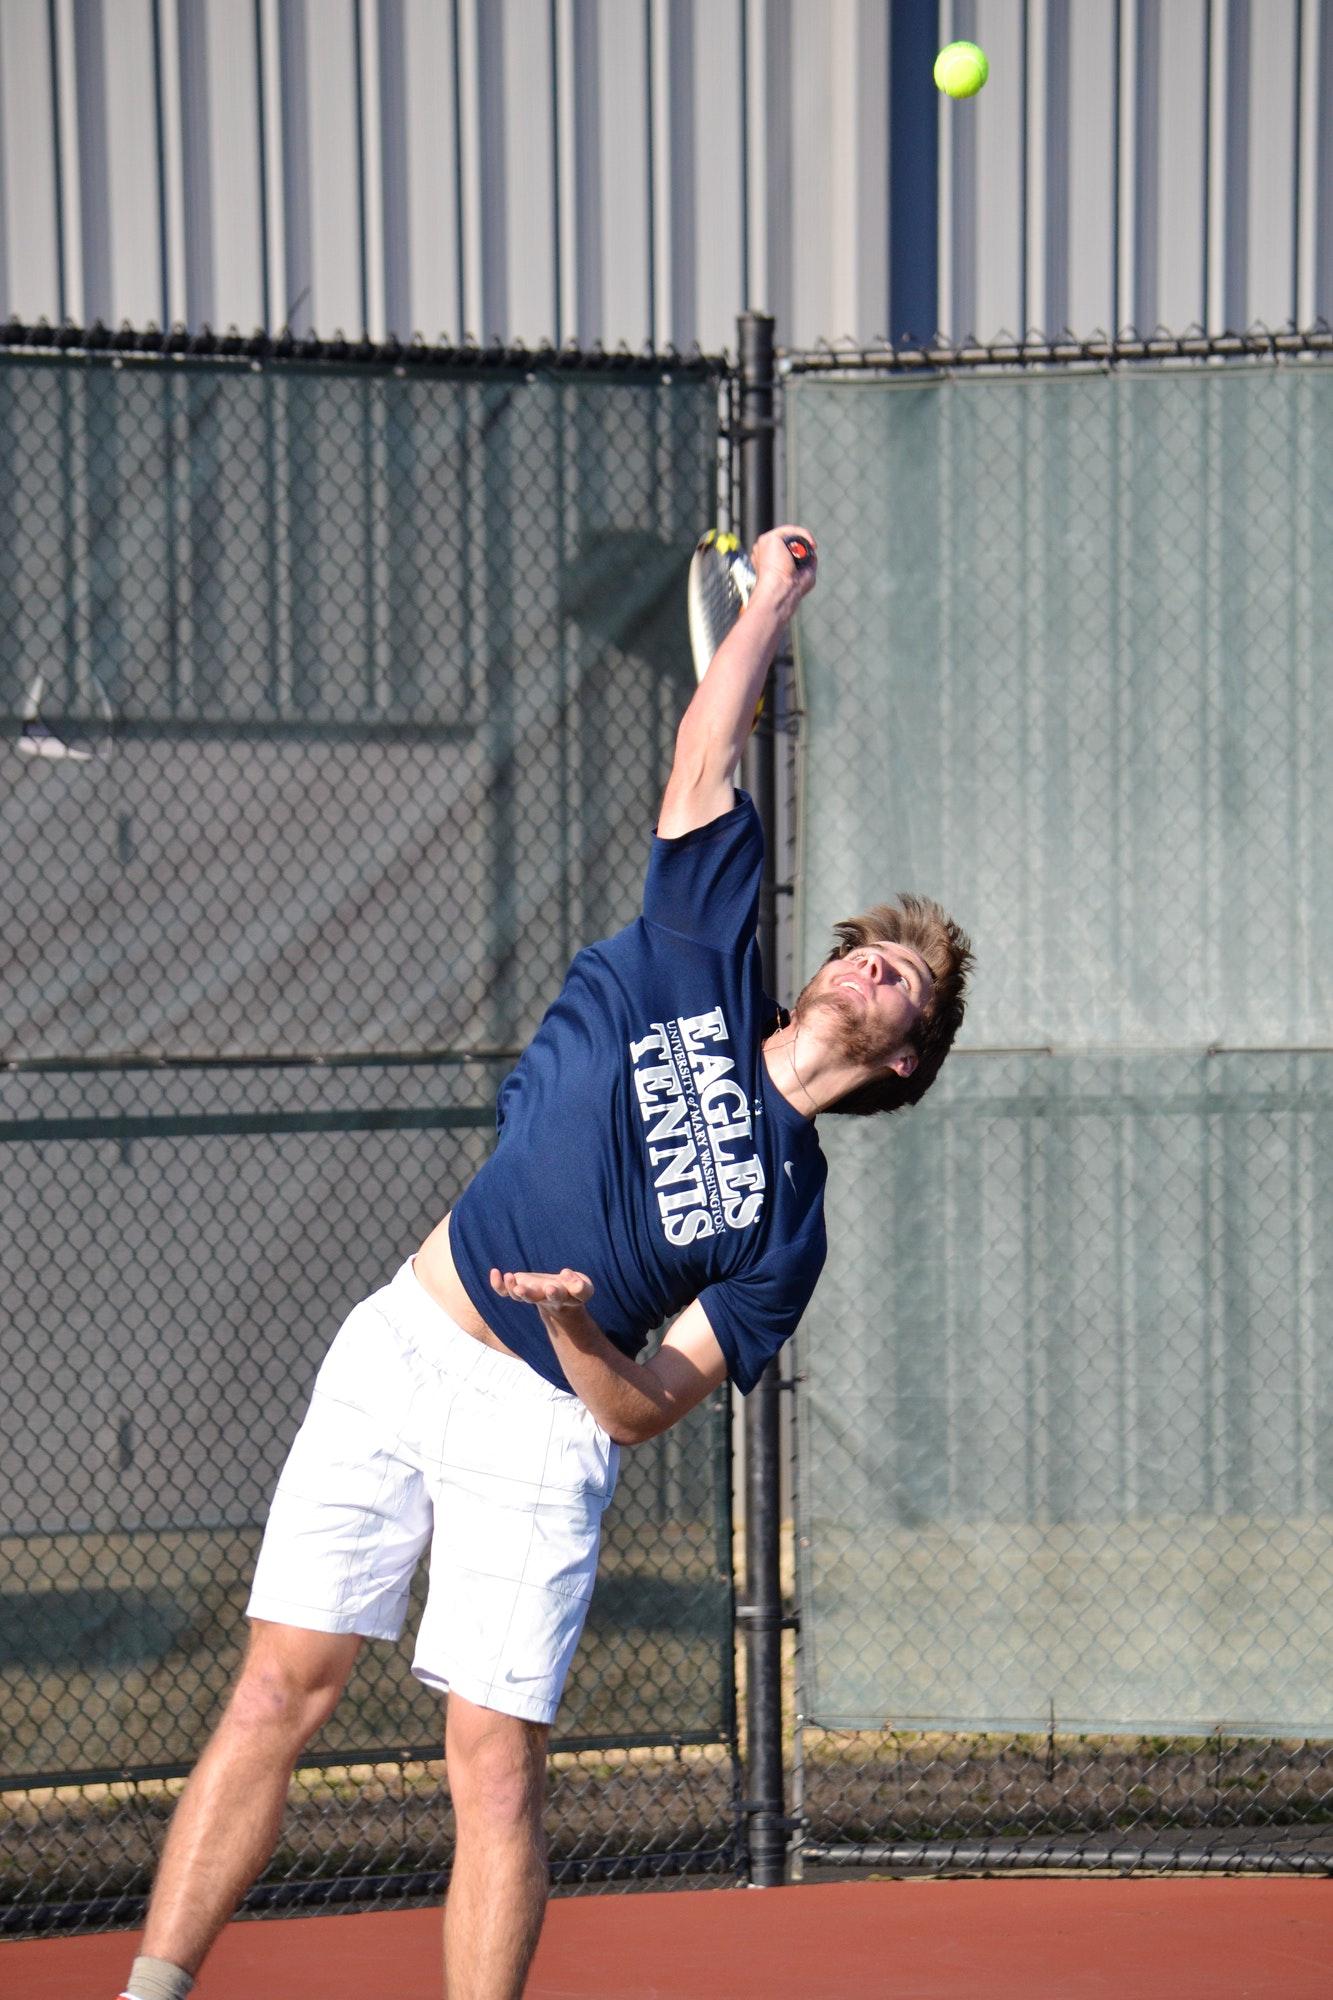 Scott B. teaches tennis lessons in Charlotte, NC